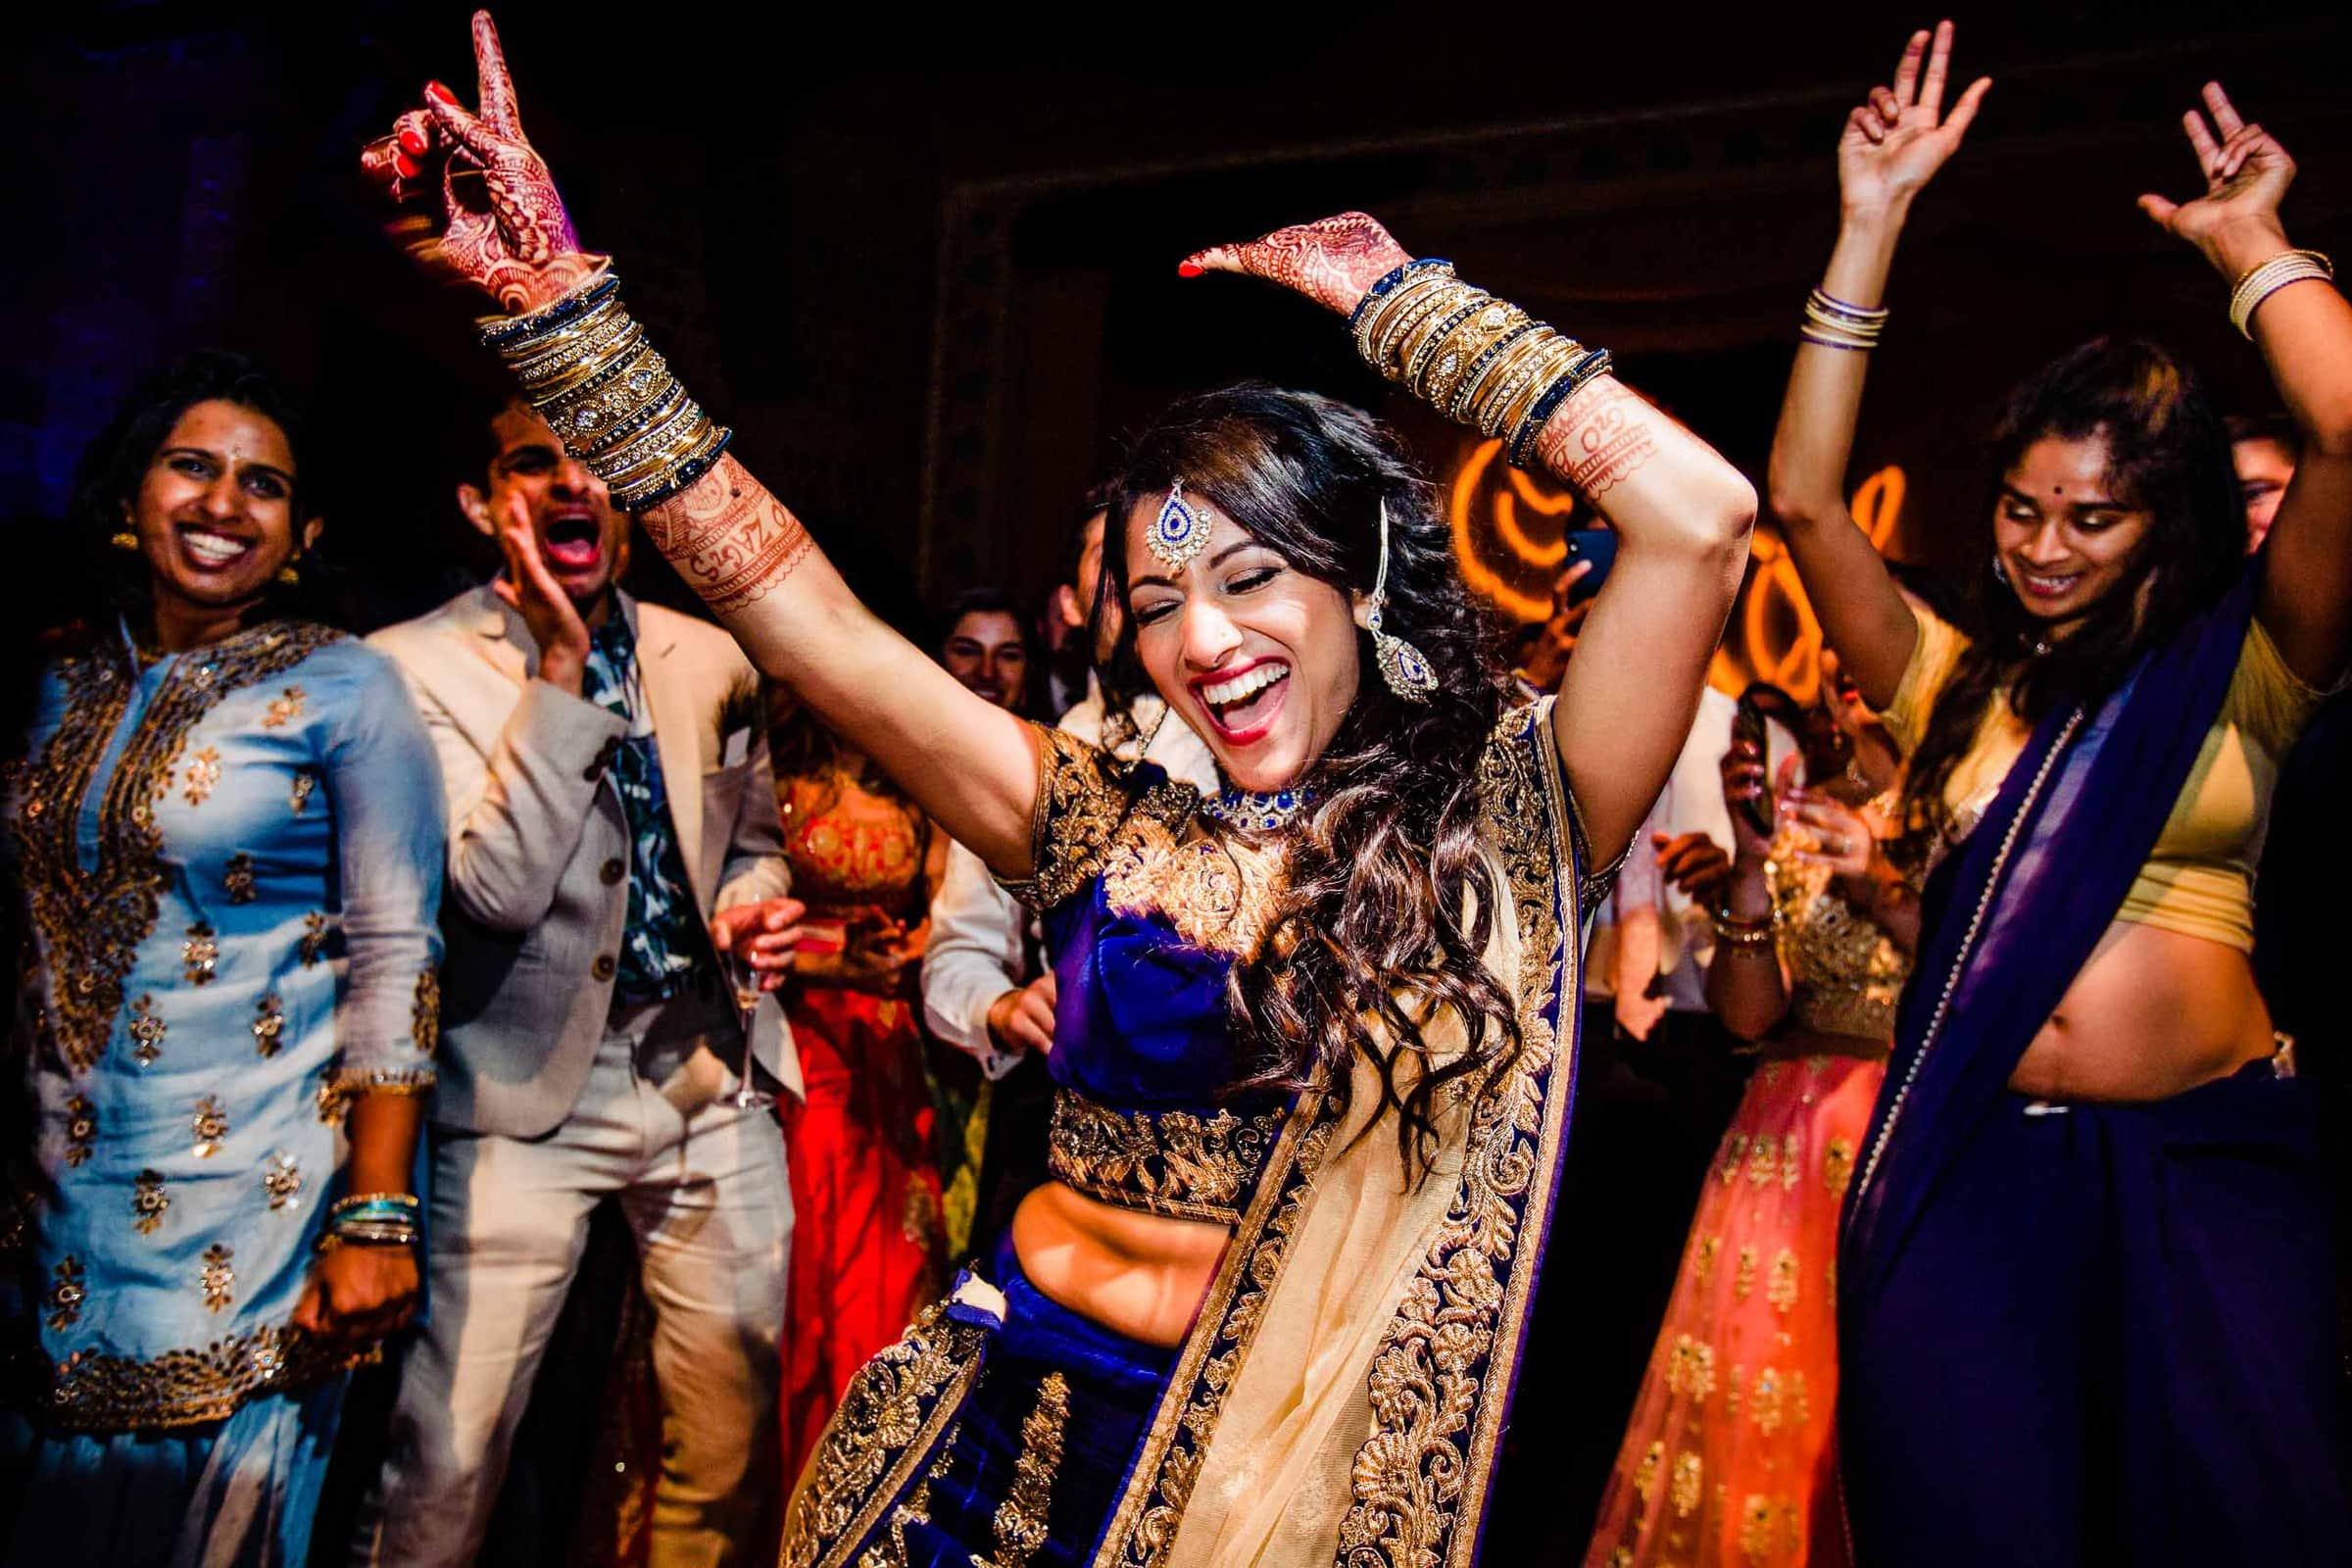 Ecstatic dancing photo of an Indian bride during her Portland Art museum wedding.